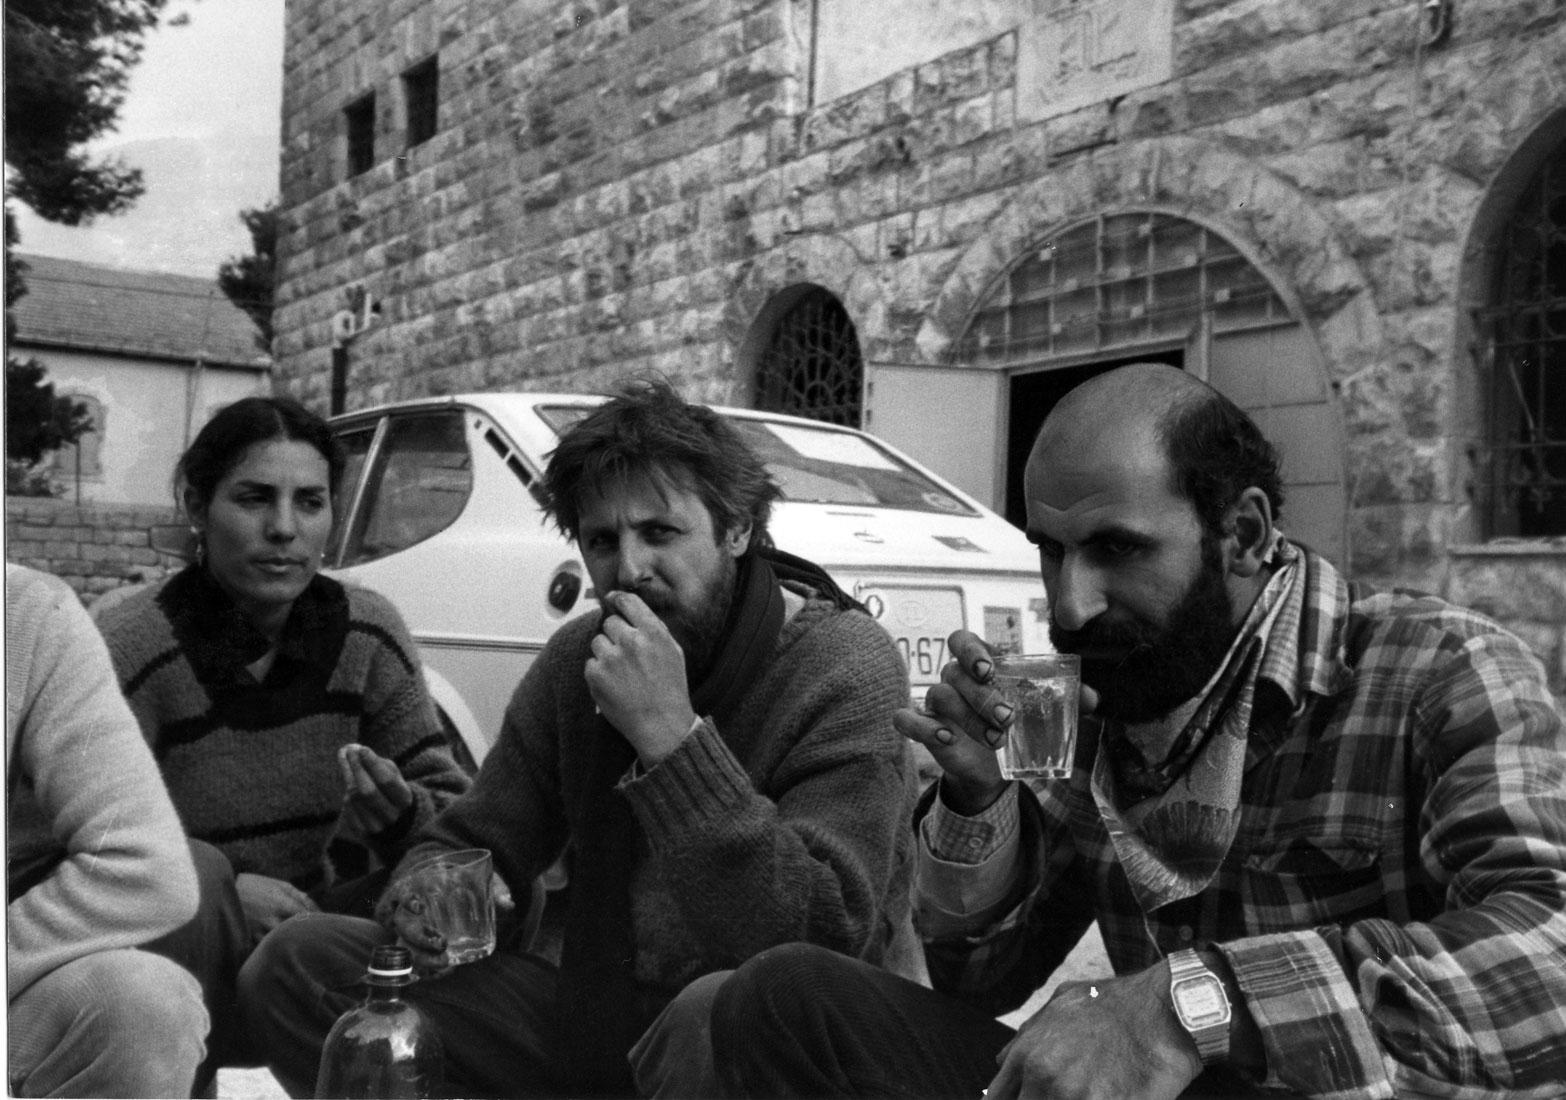 Edward Muallem, Francois Abu Salem, Jackie Lübeck, lunch break during the restoration 1983